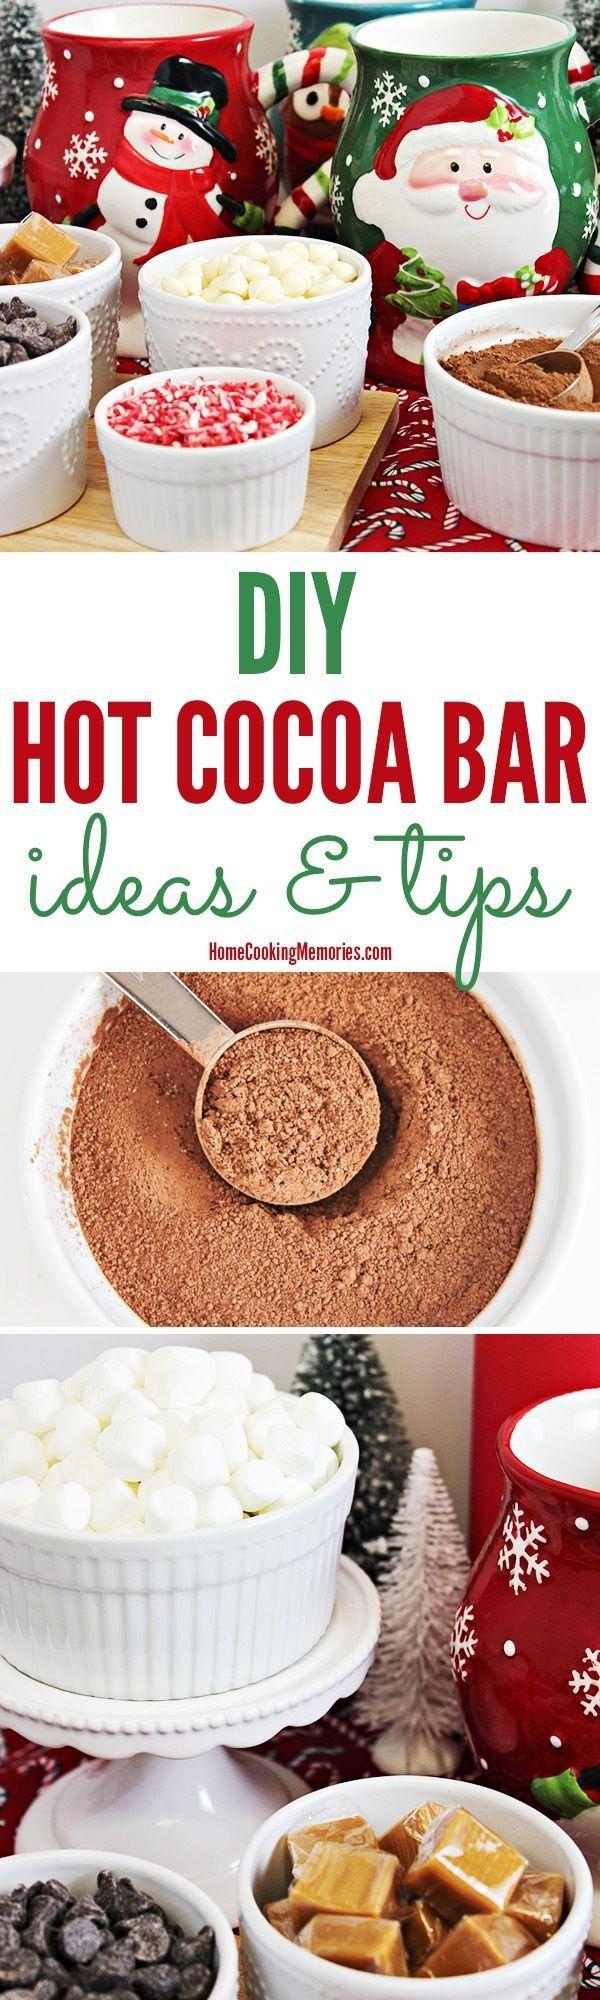 DIY Holiday Hot Chocolate Bar Ideas & Tips - Home Cooking Memories #hotchocolatebar